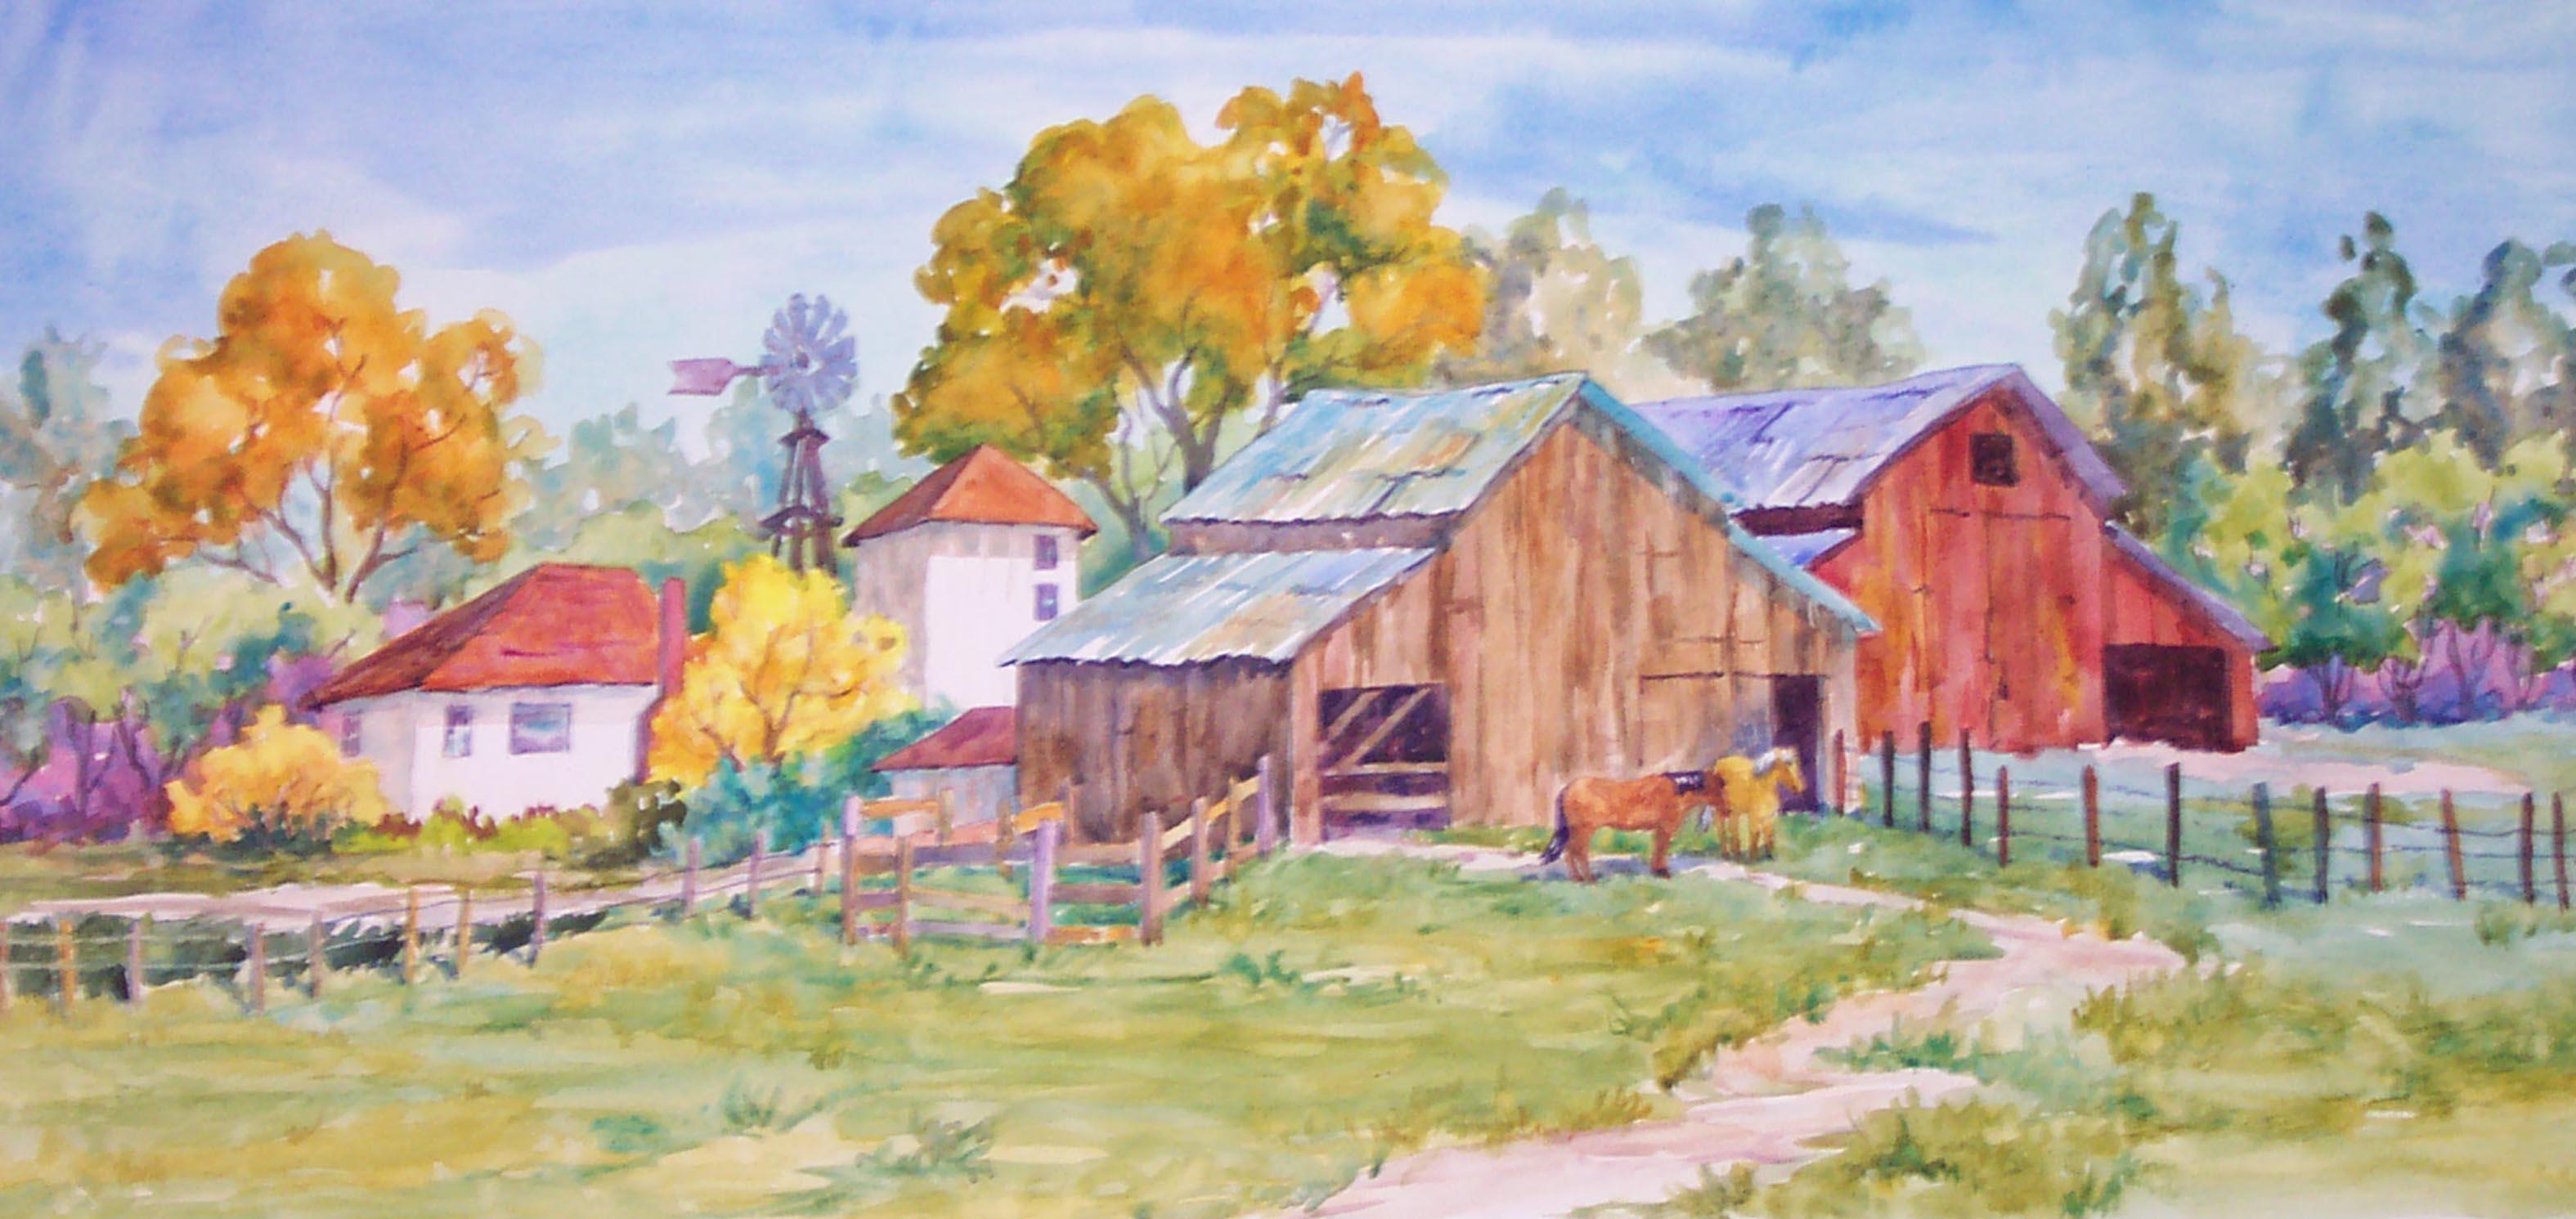 3150x1491 Fineart Gallery,original Art,watercolor Paintings,landscape Art